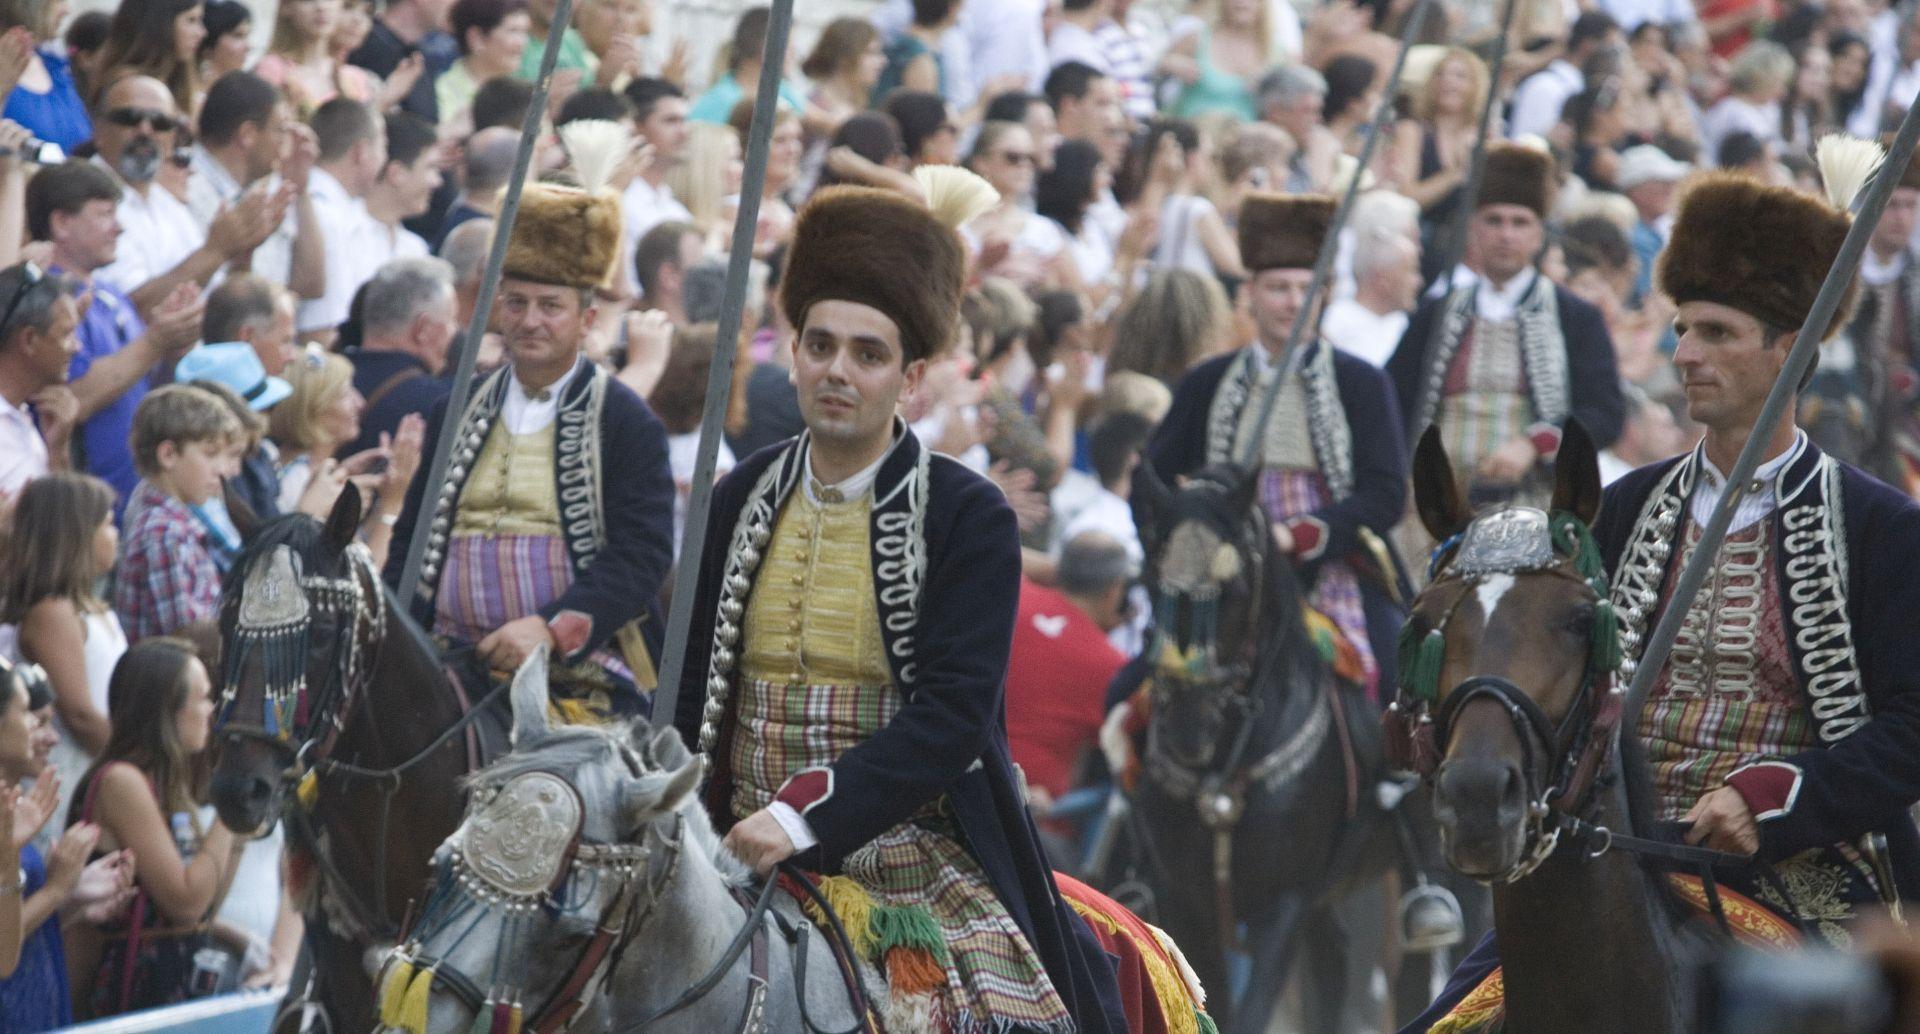 Pobjednik Svečane sinjske alke u Vukovaru je alkar Ante Zorica